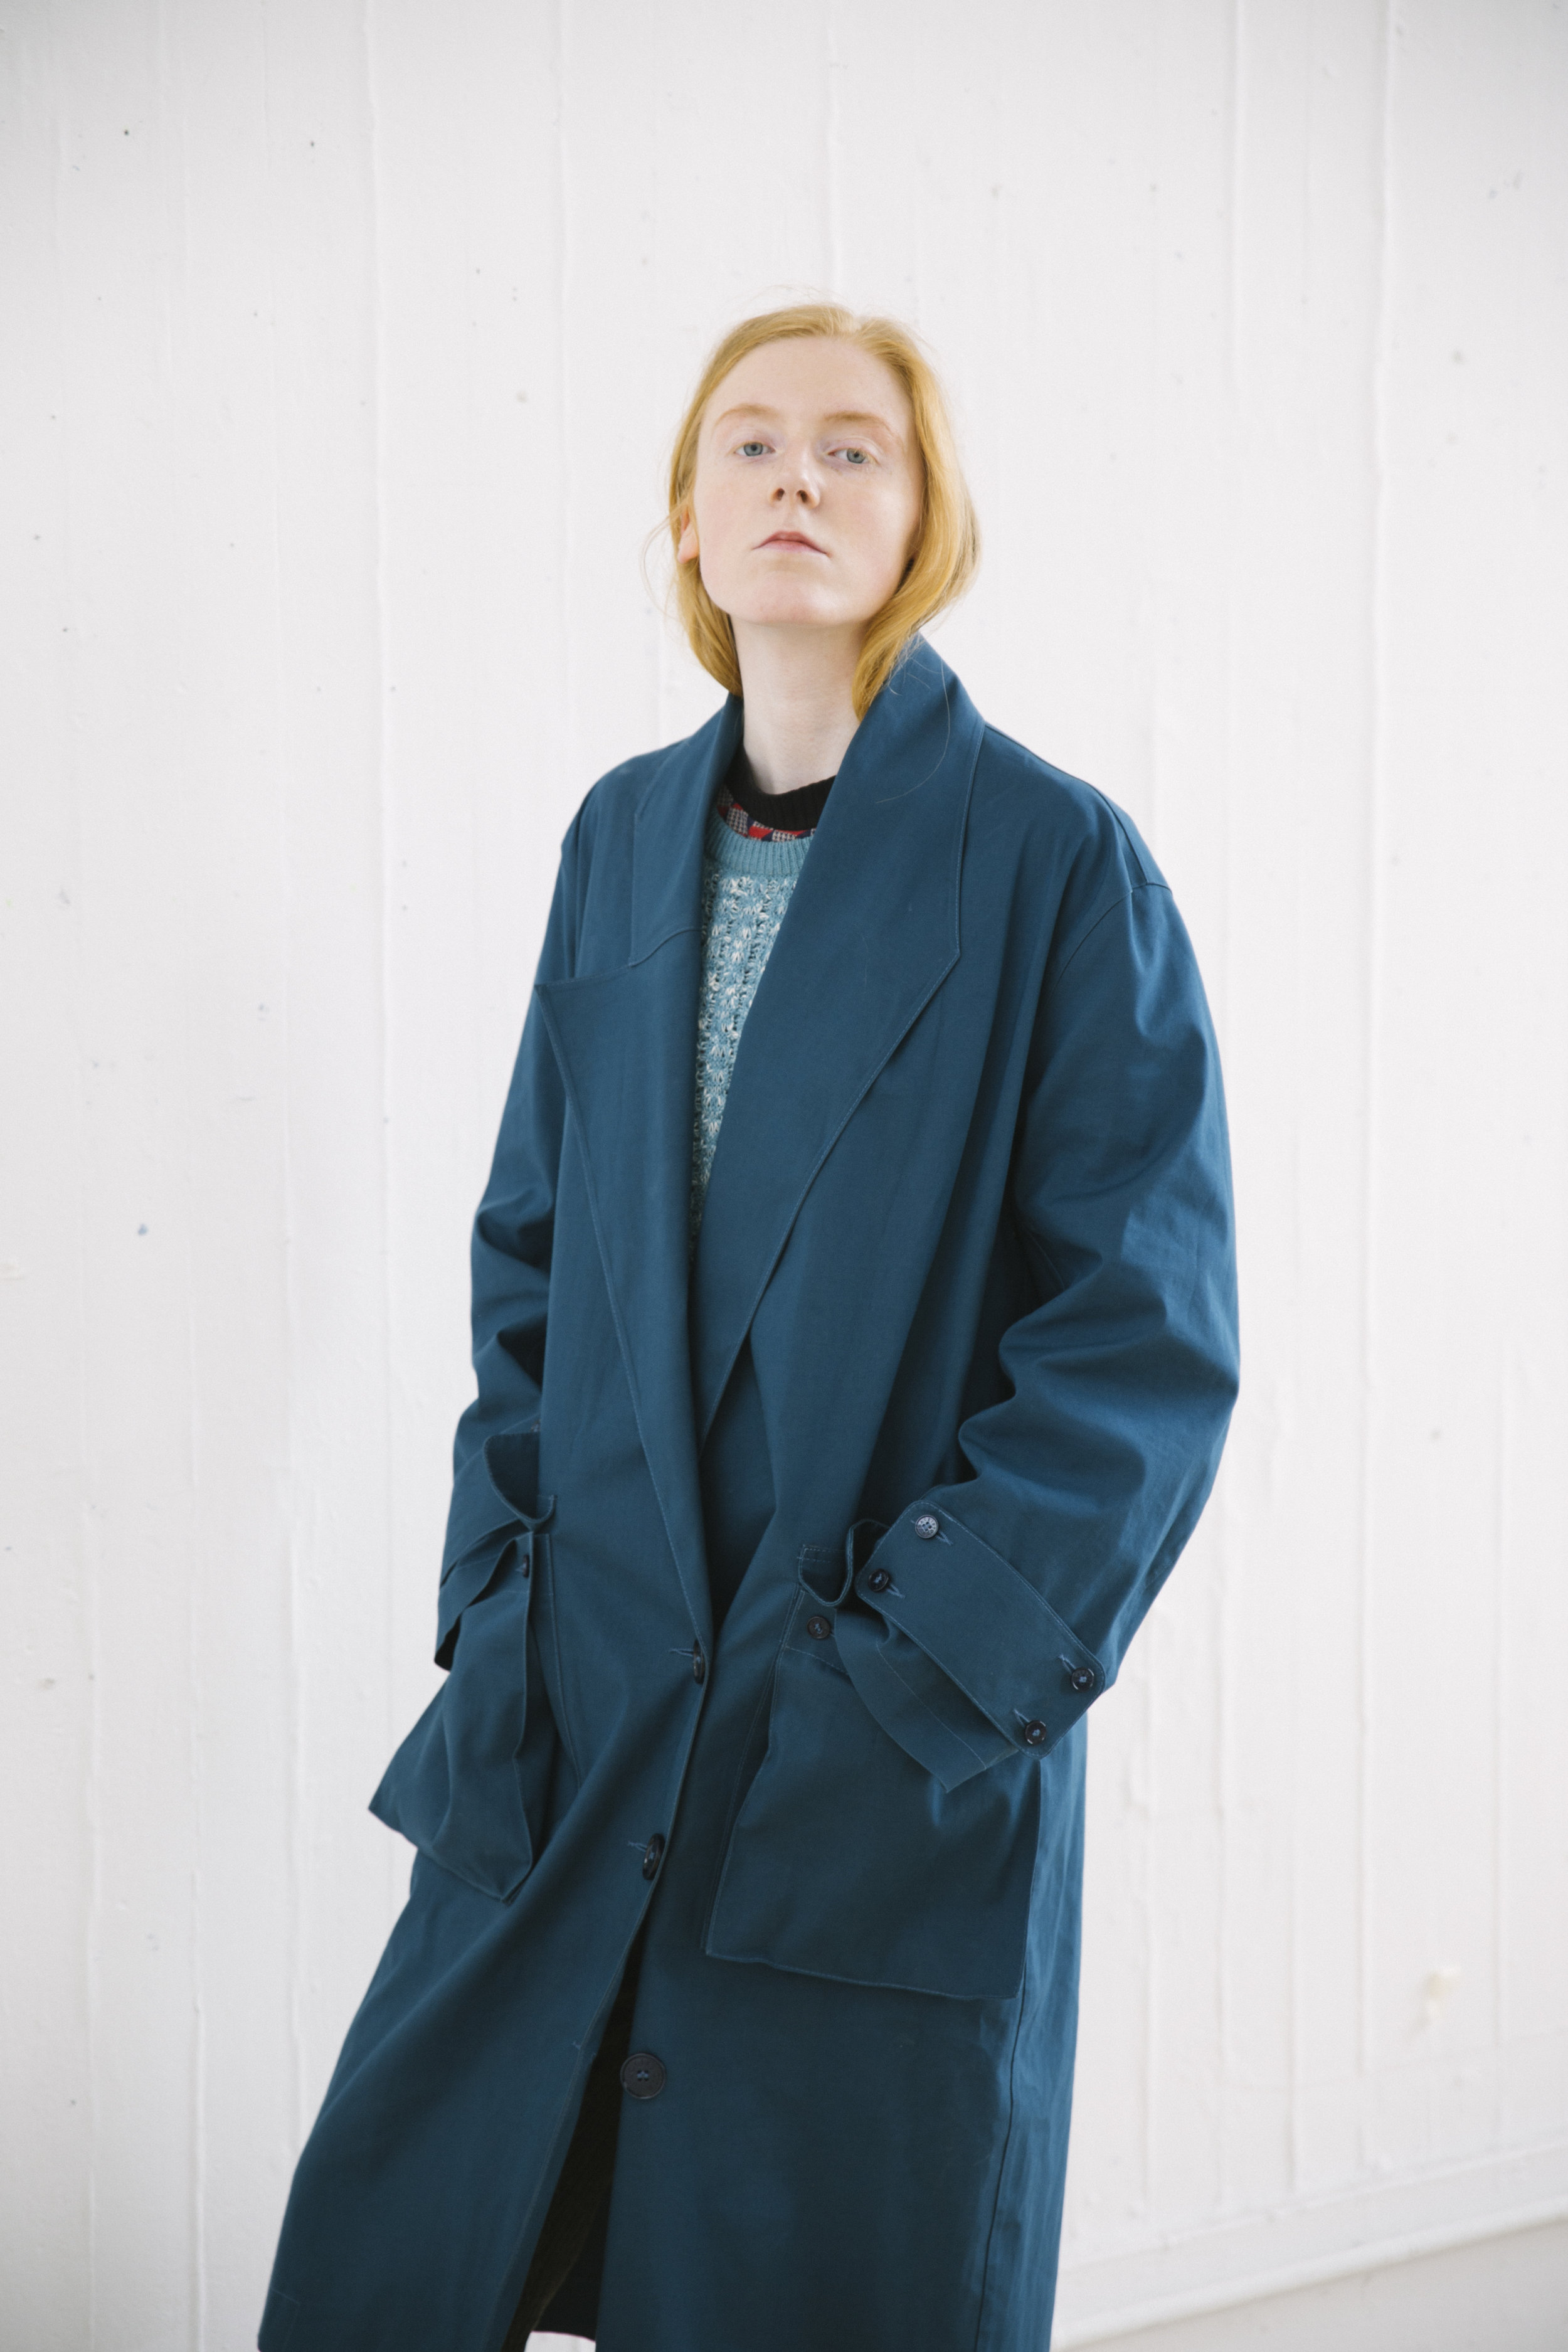 Model: Ruth Williams